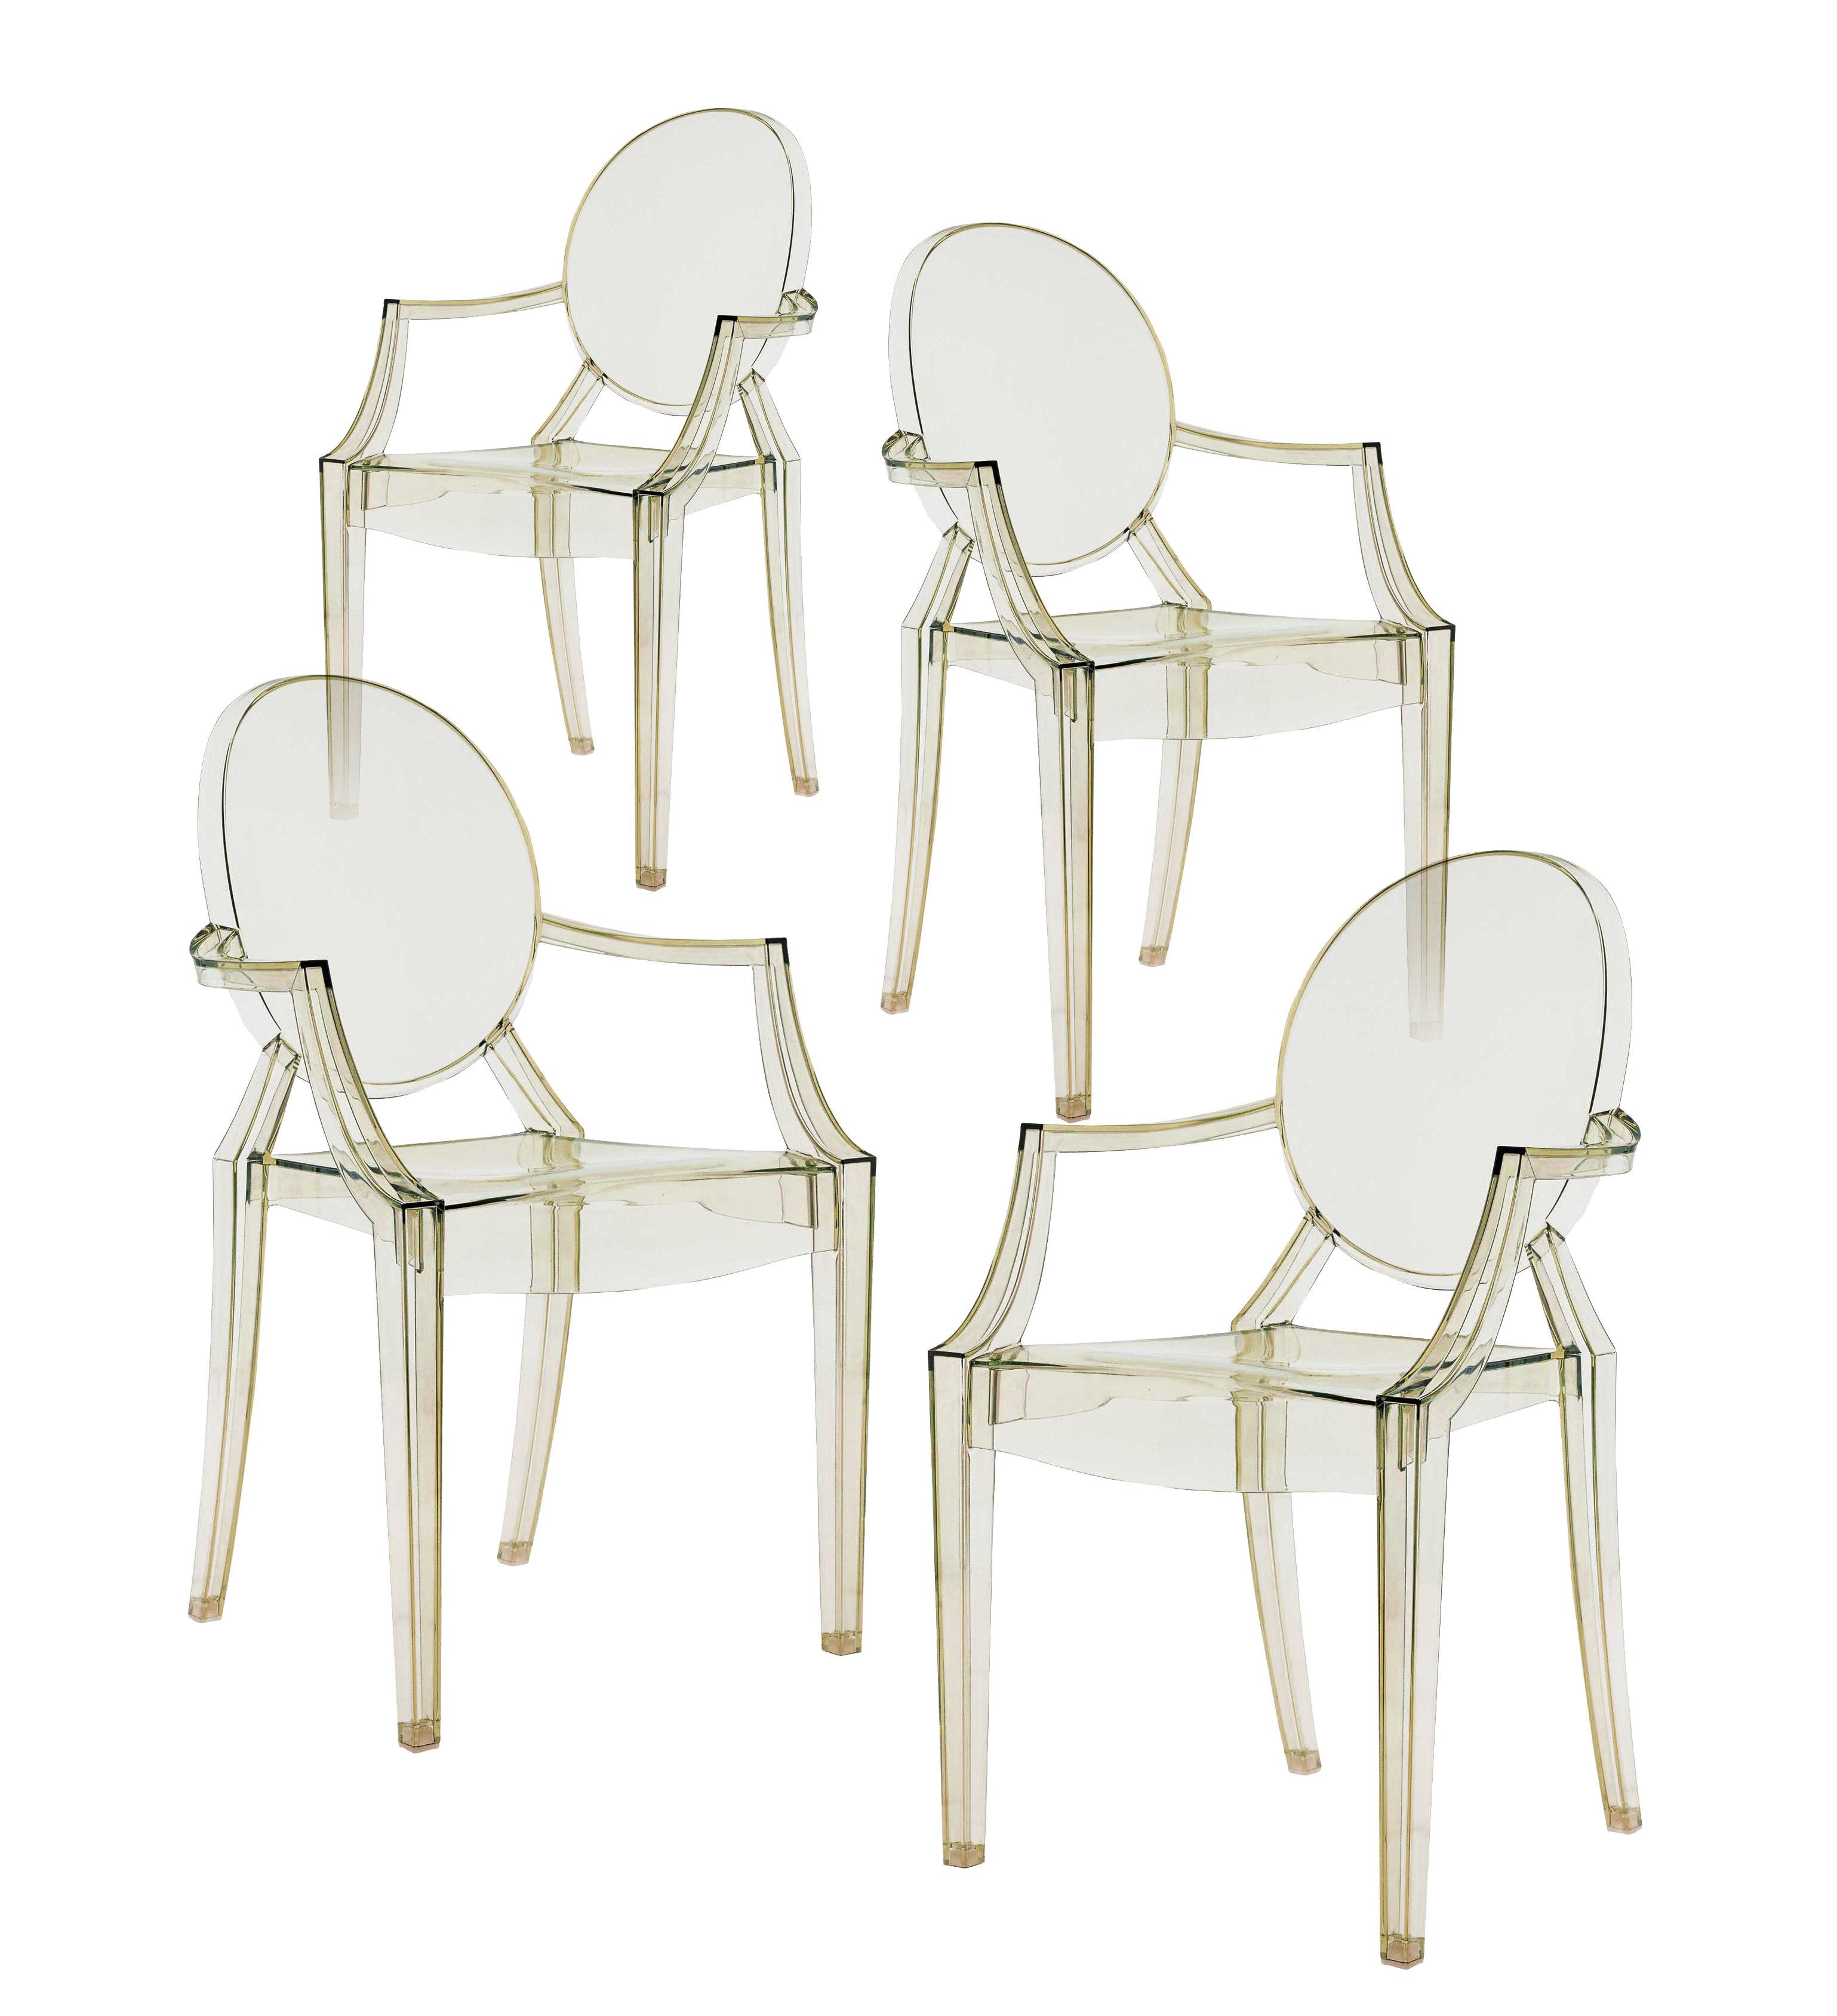 fauteuil empilable louis ghost lot de 4 jaune kartell. Black Bedroom Furniture Sets. Home Design Ideas